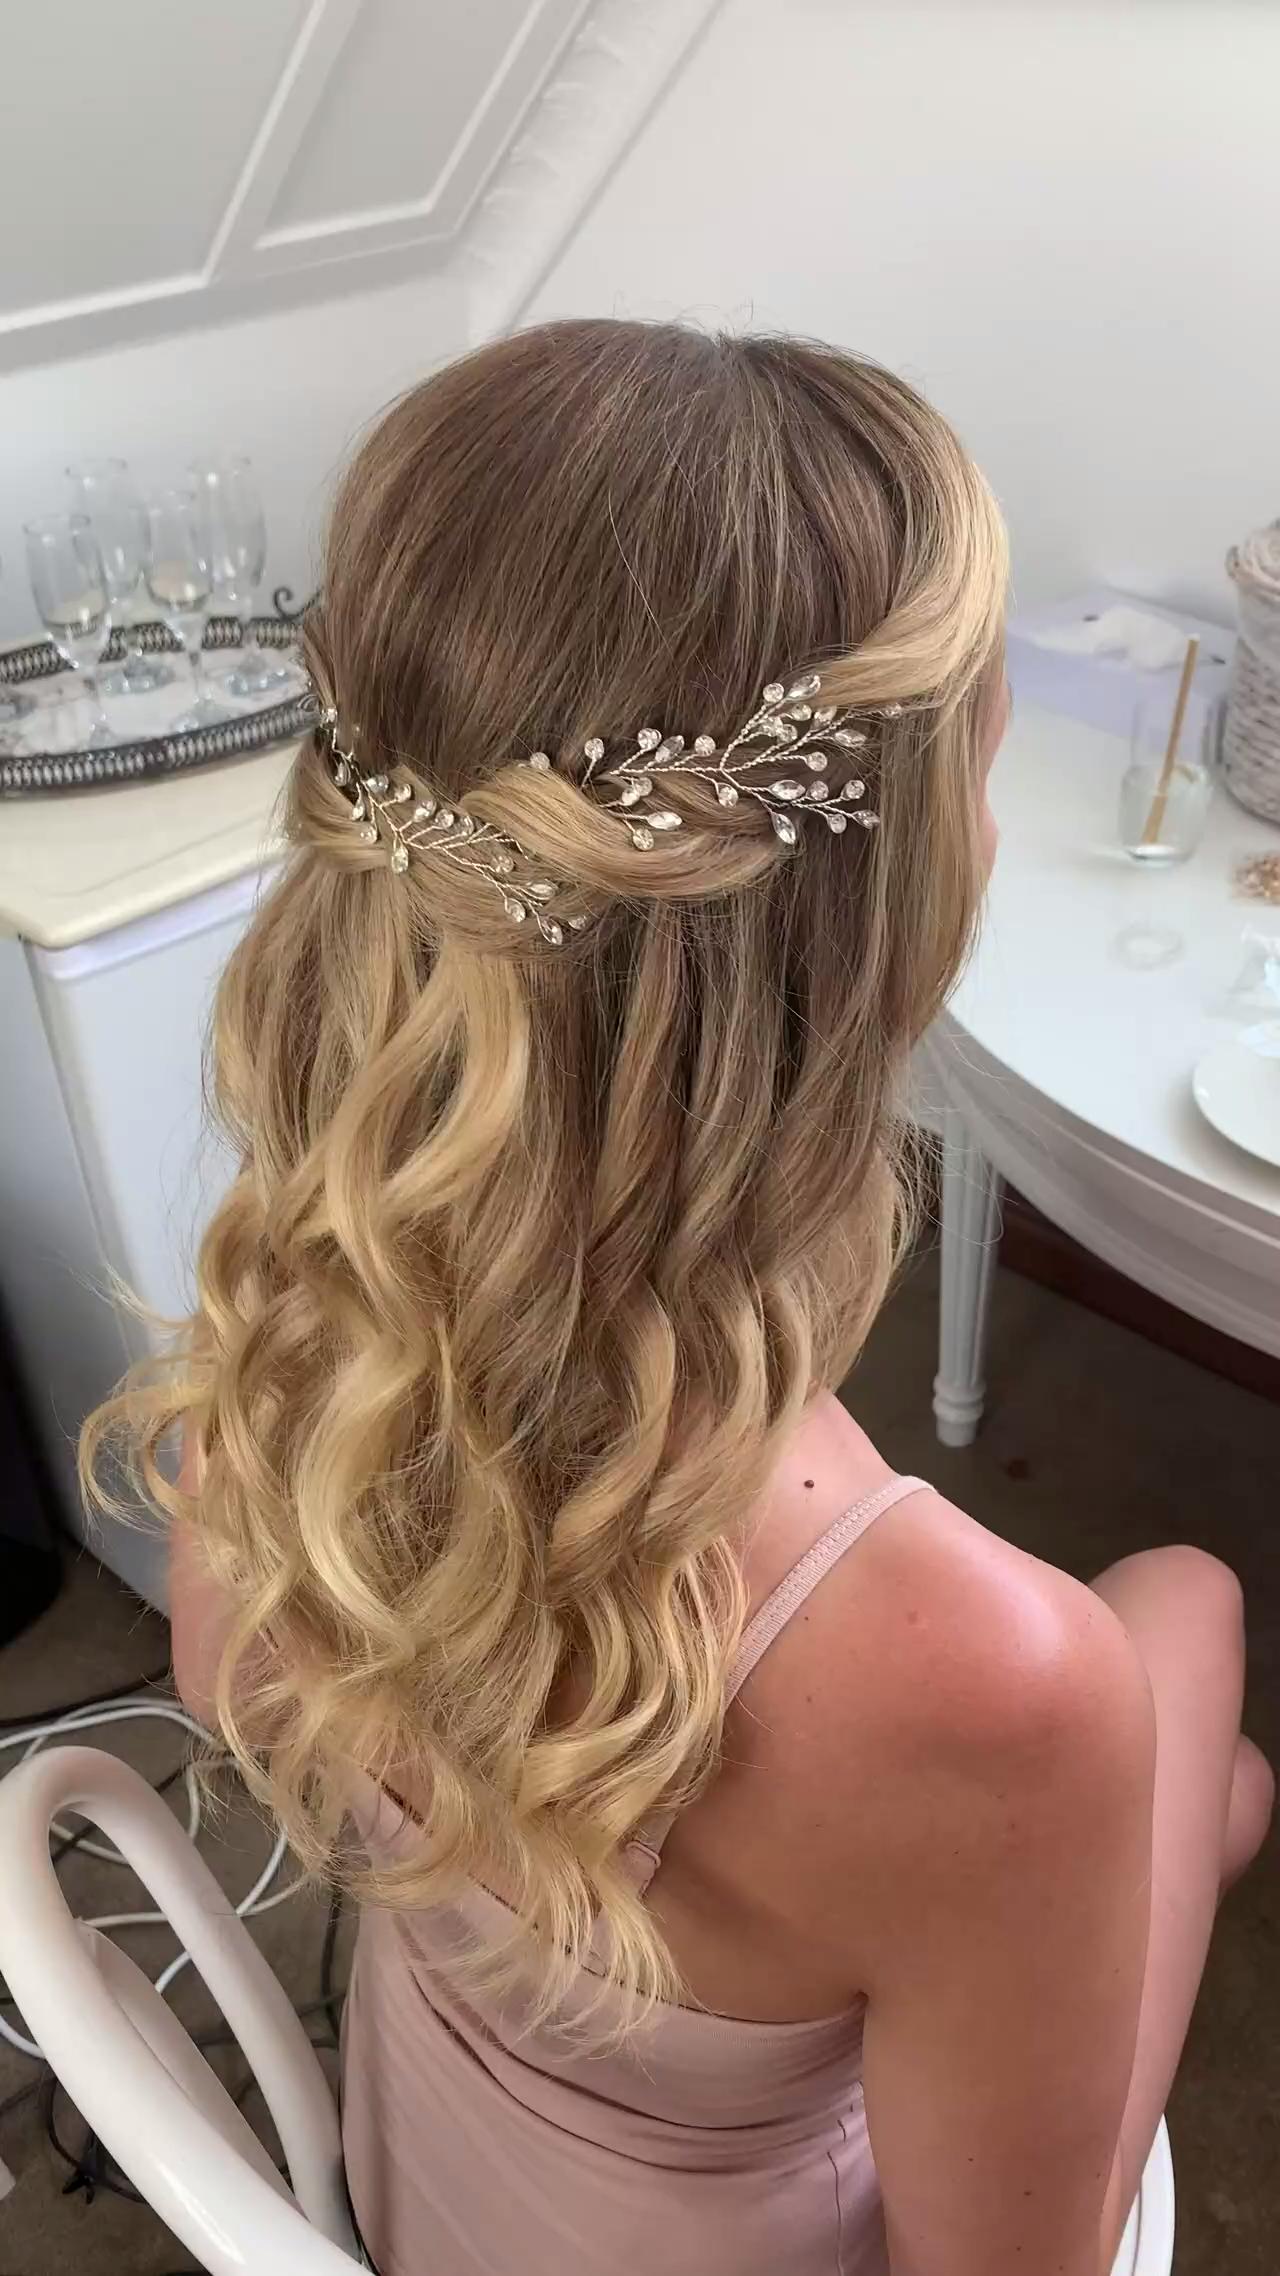 Peinado de novia mitad arriba mitad abajo